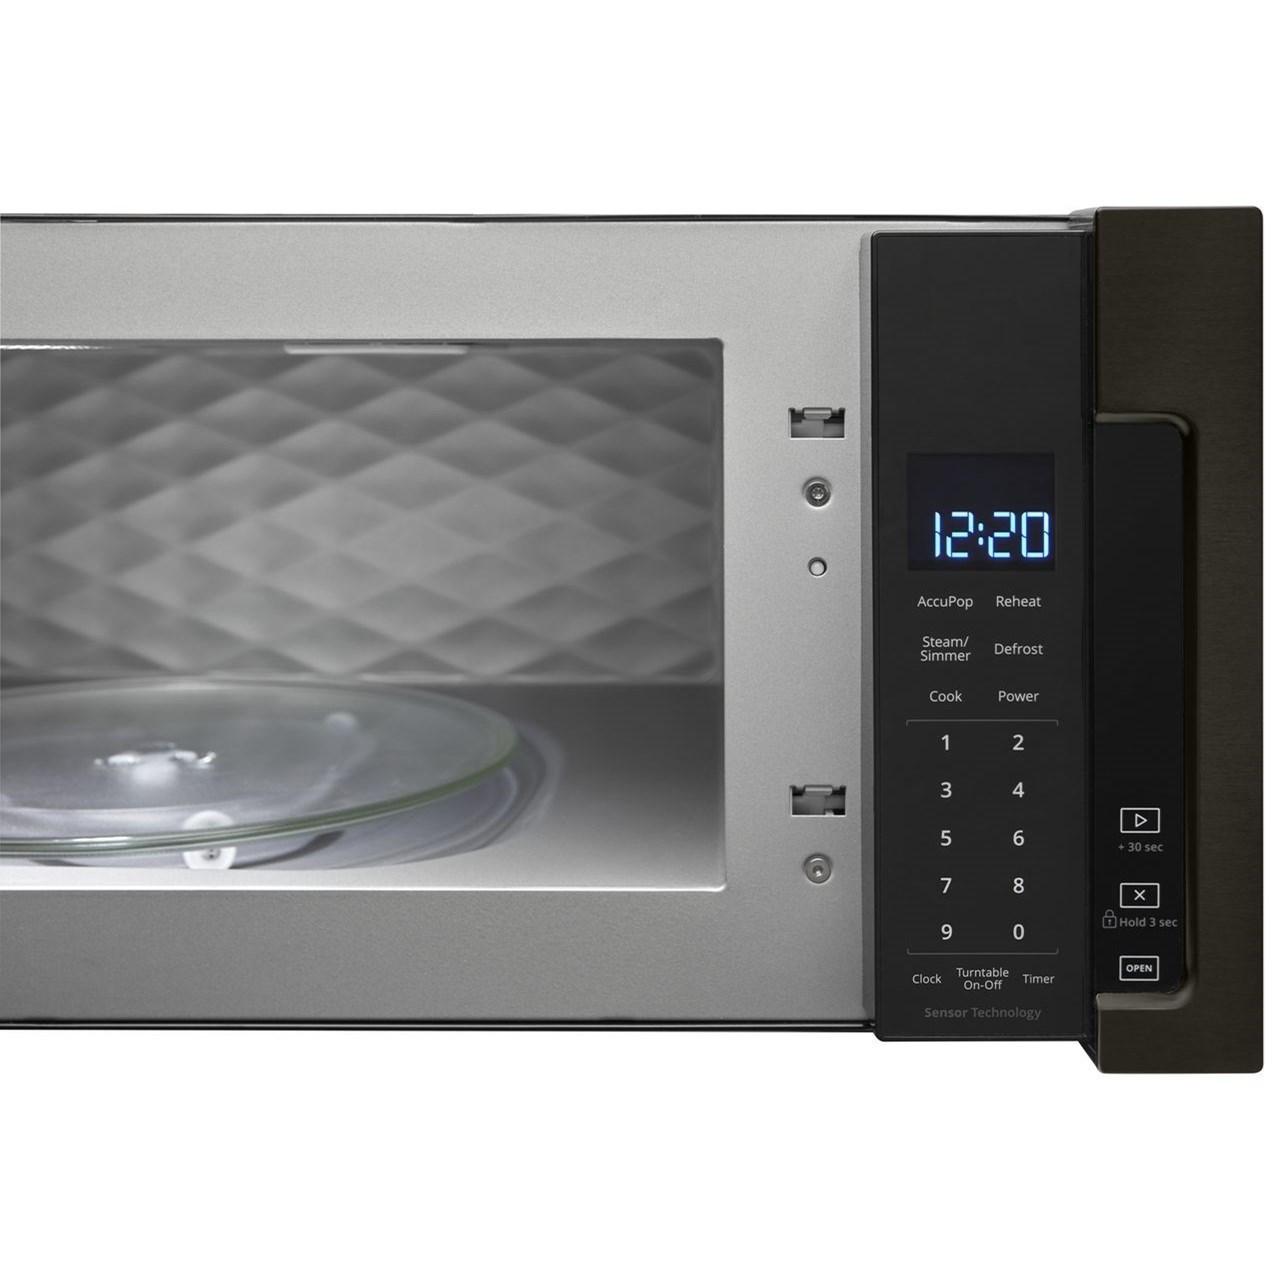 Whirlpool Wml75011hv1 1 Cu Ft Low Profile Microwave Hood